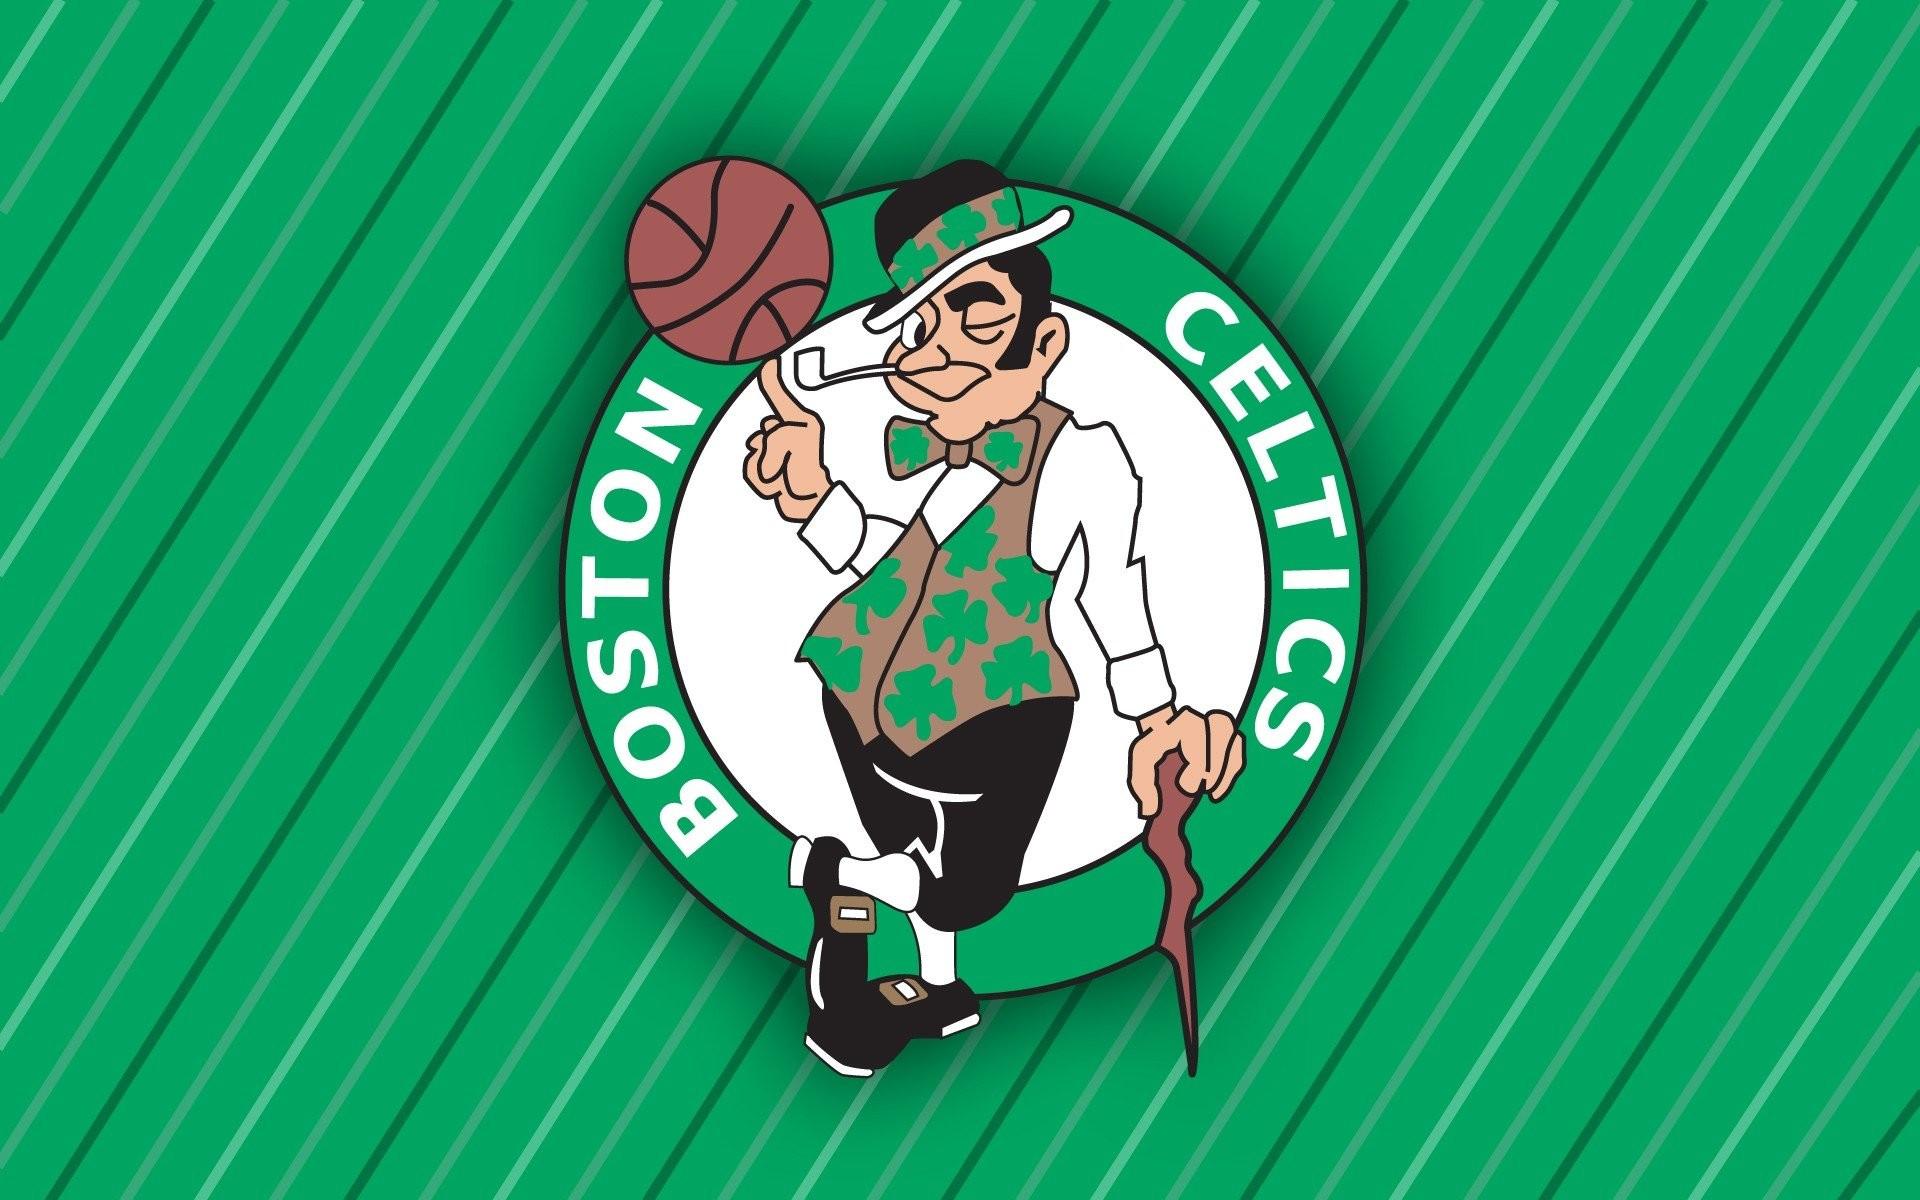 Lrg Iphone 5 Wallpaper Boston Celtics Iphone Wallpaper 66 Images